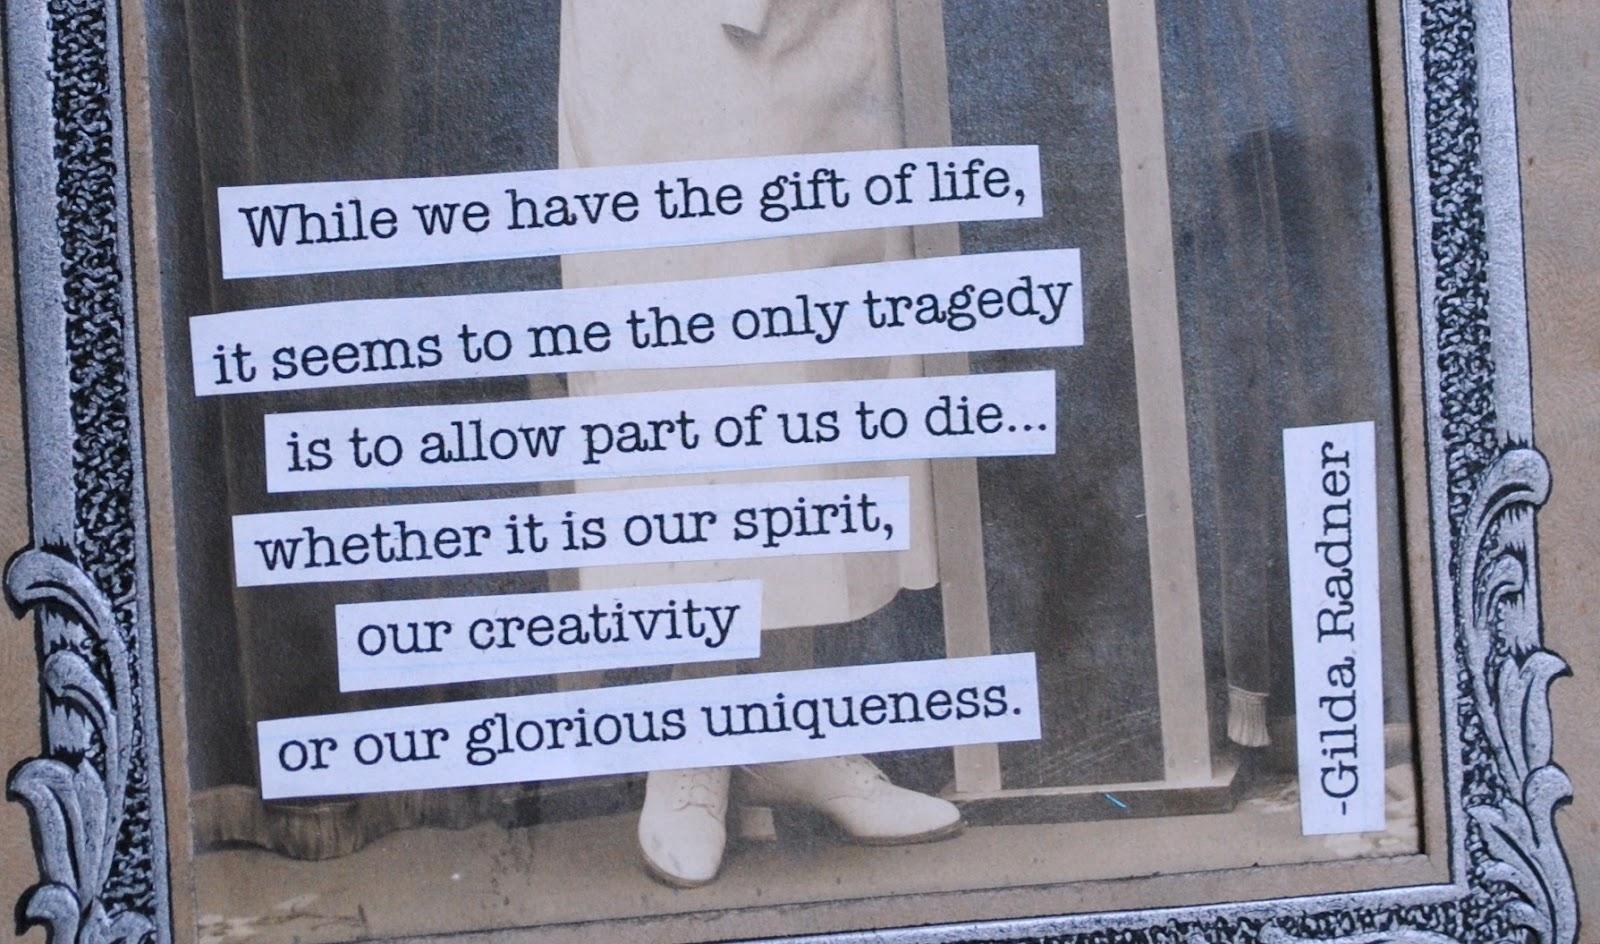 Gilda Radner's quote #3